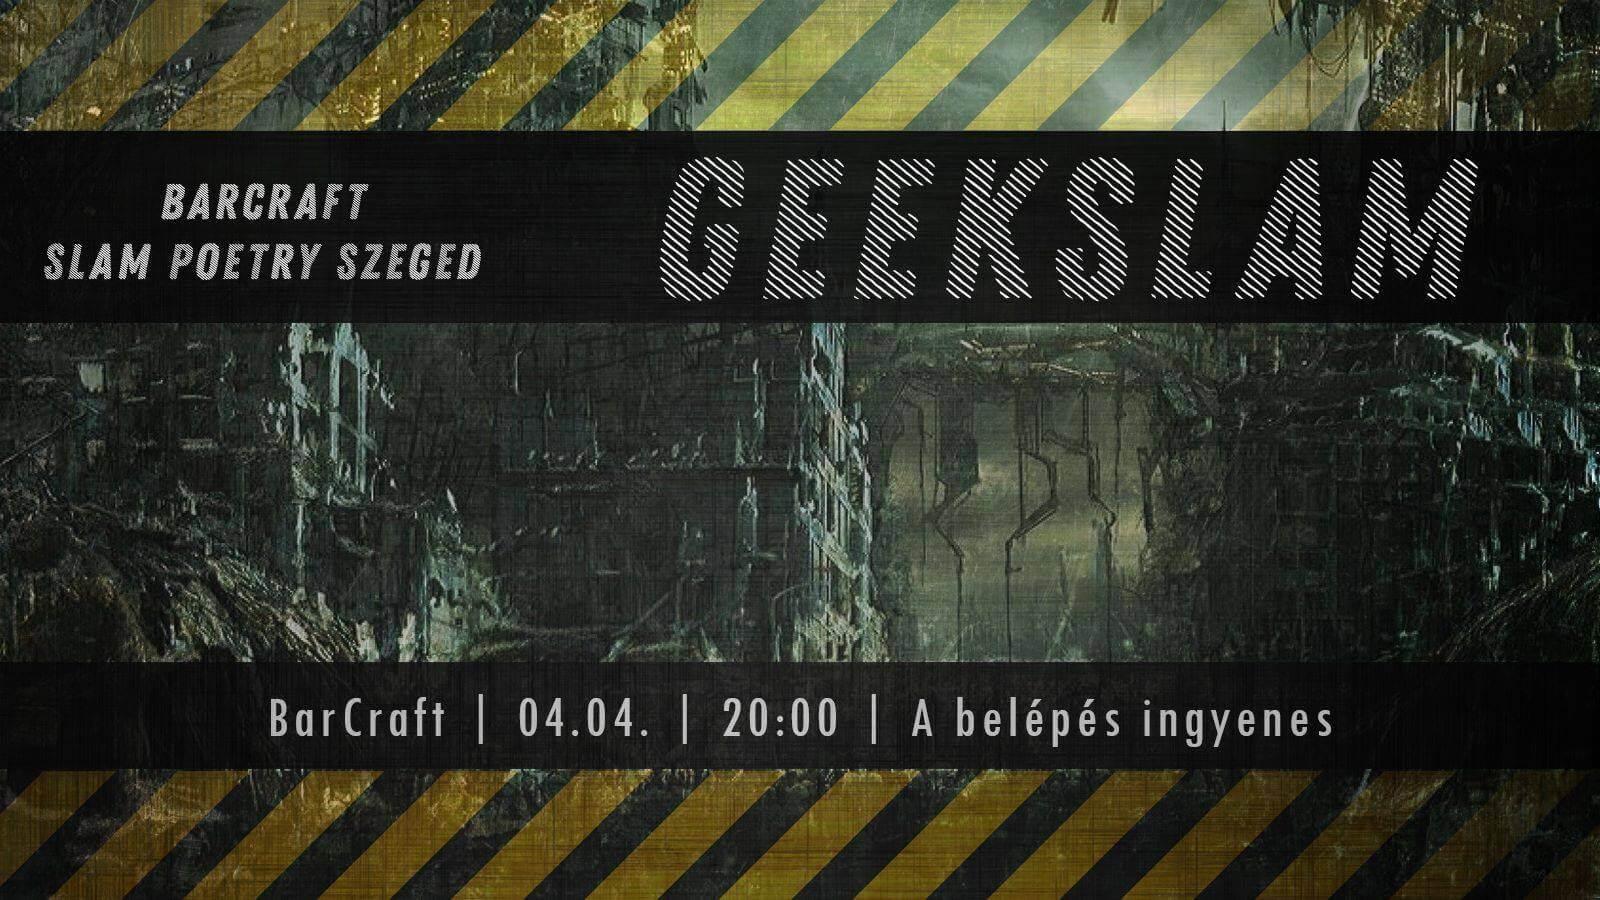 GeekSlam x BarCraft